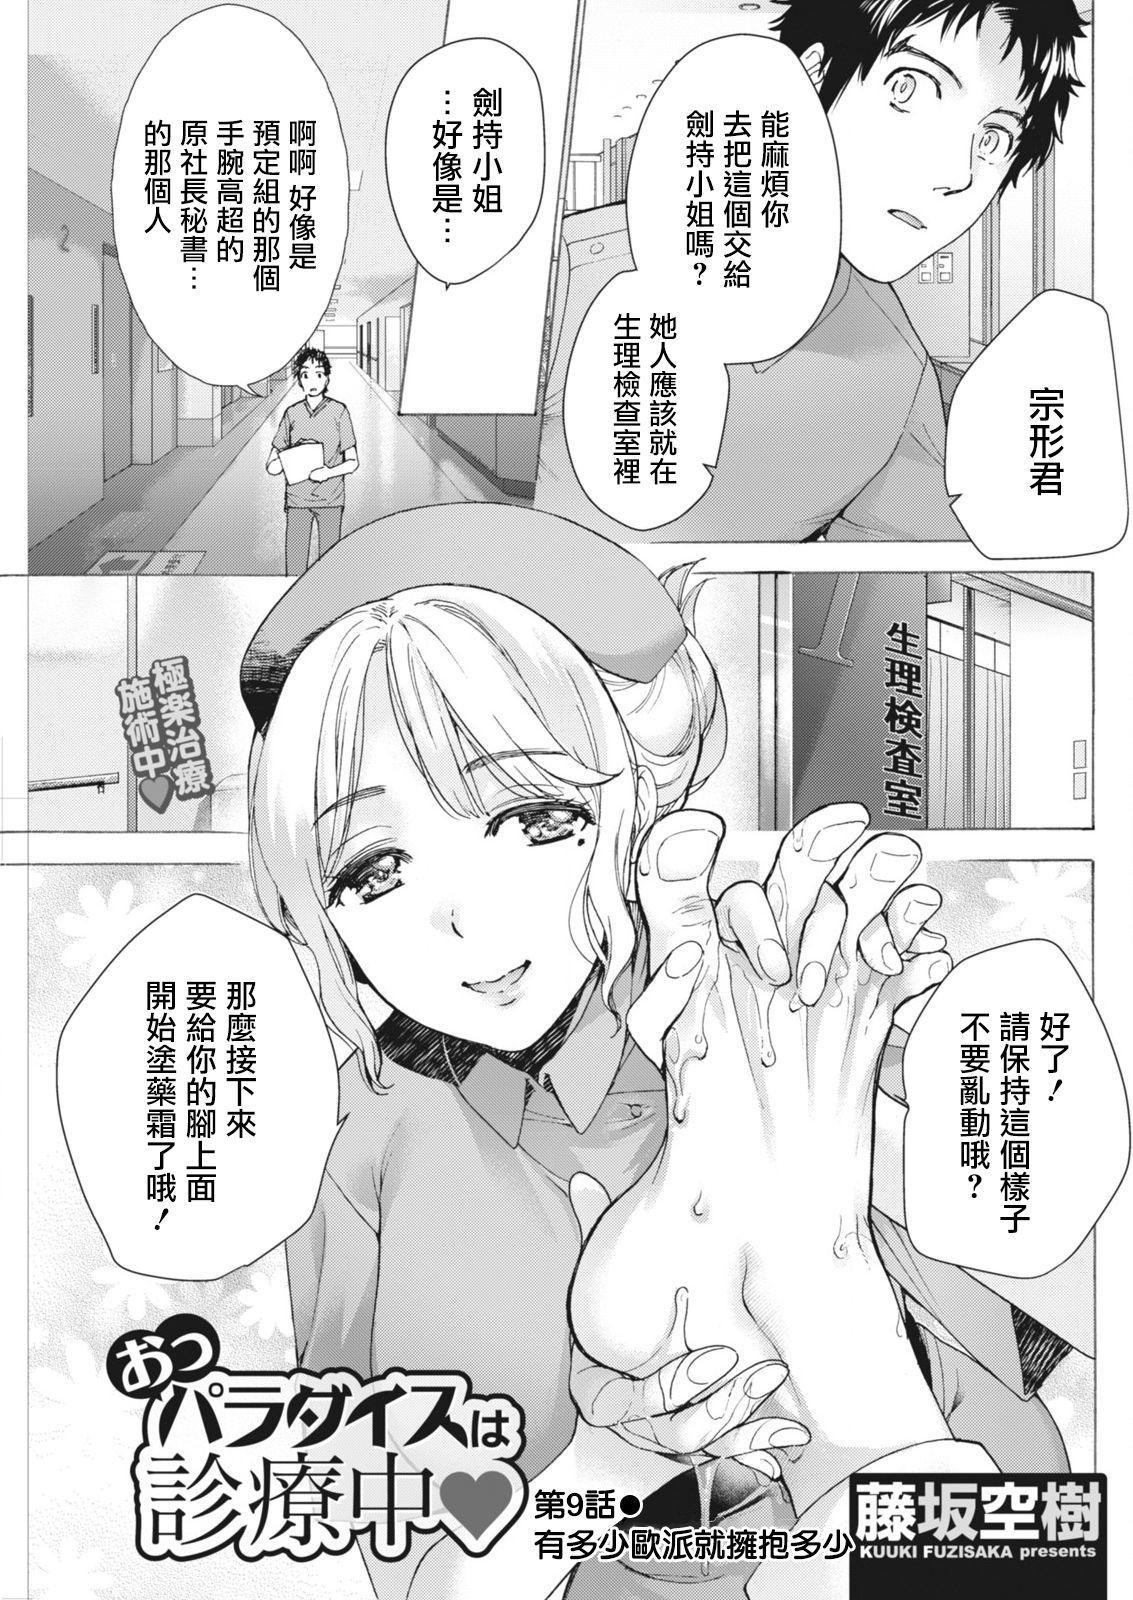 Opparadise wa Shinryouchu | 欧派天国诊疗中 Ch. 9 0